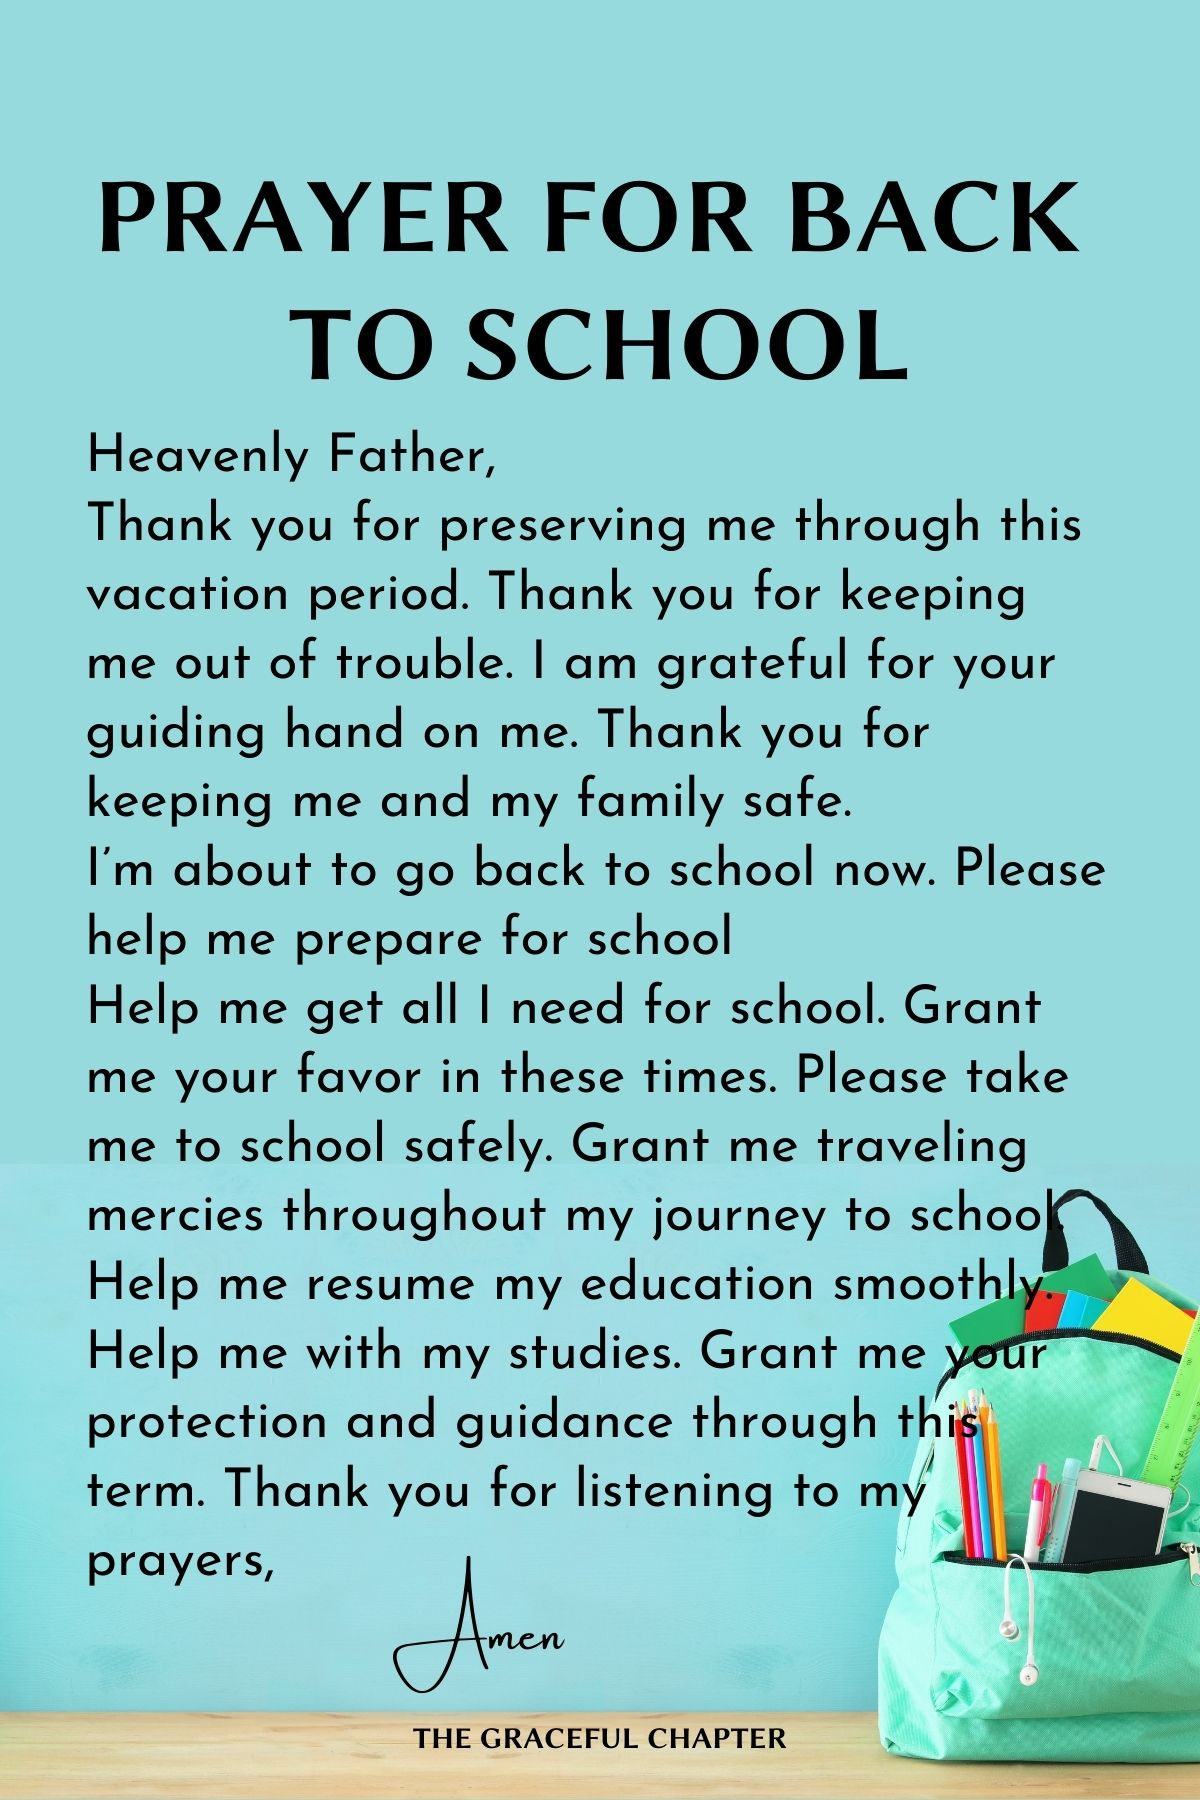 Prayer for back to school